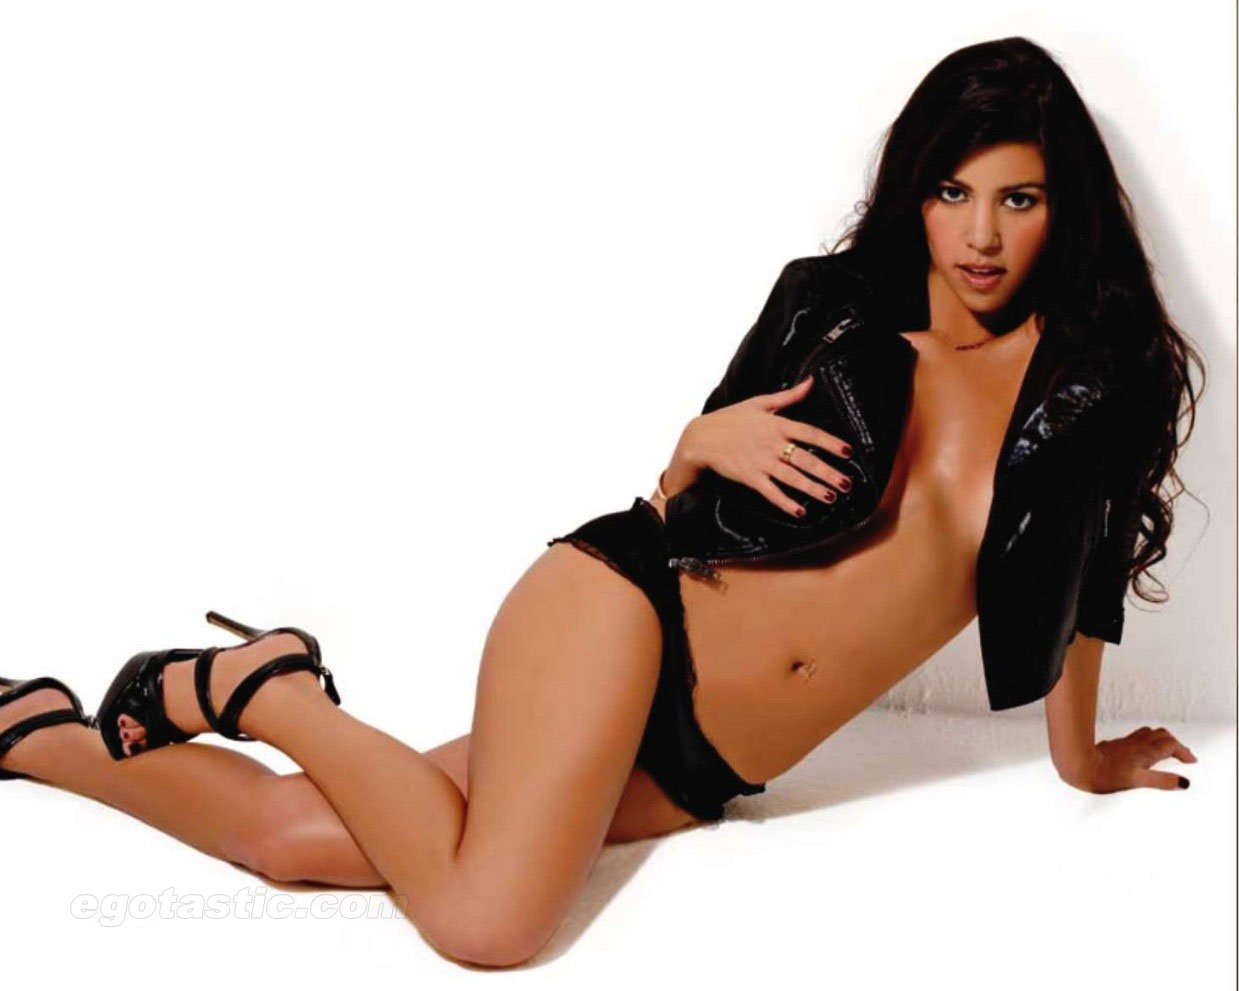 Kourtney Kardashian In Sexy Swimsuit Shoot For Maxim India – Pictures